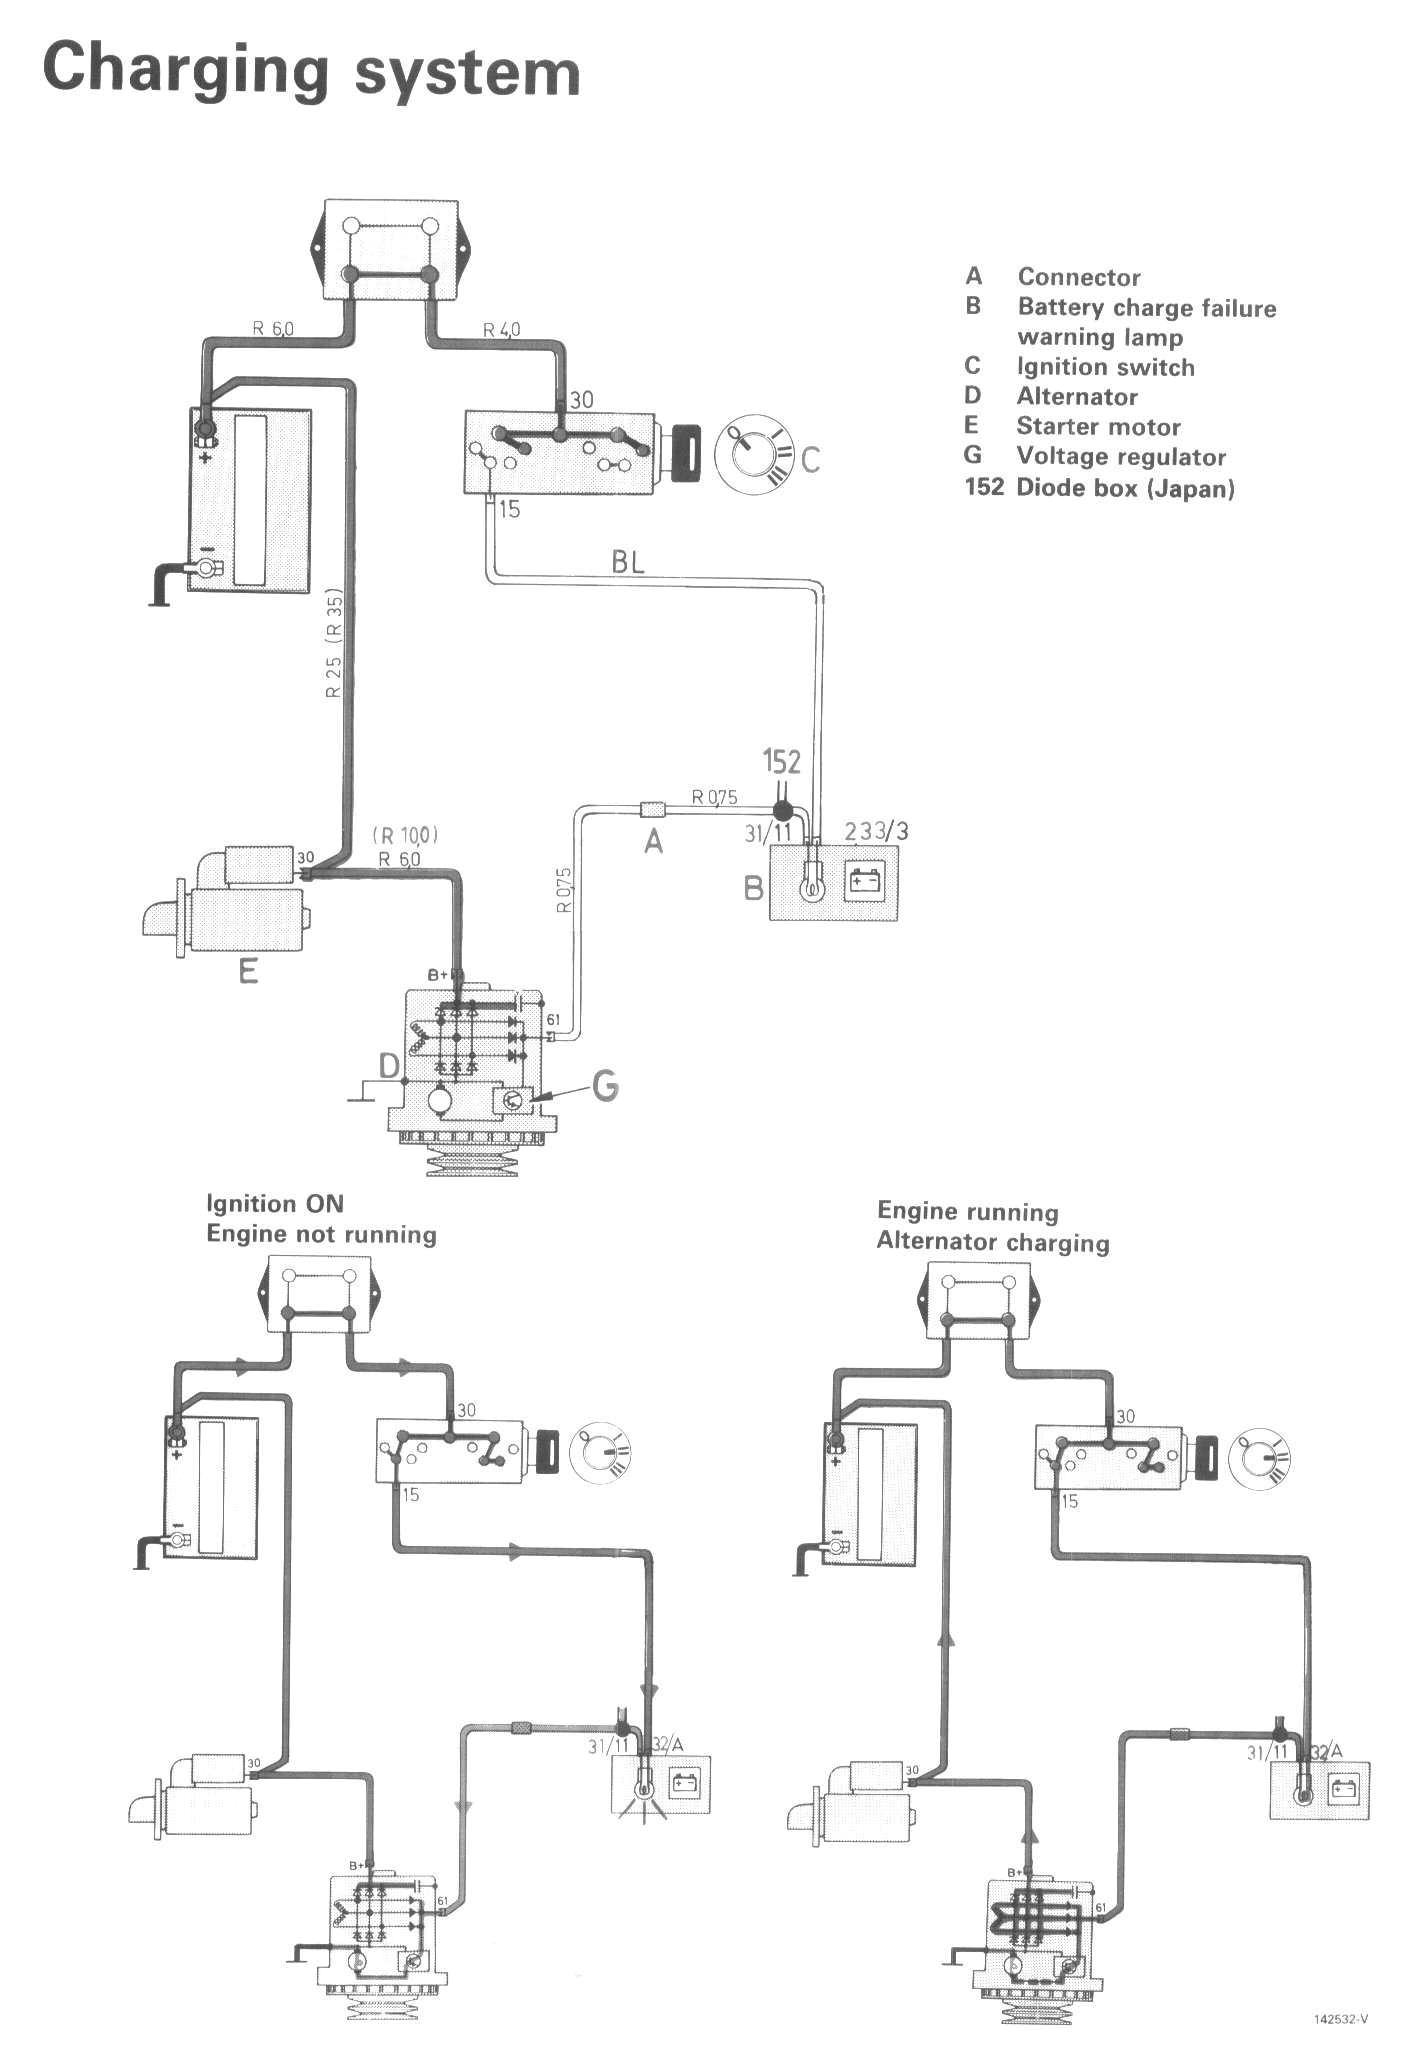 volvo 240 wiring diagram 1990 wiring diagram advance 1990 volvo 240 wiring manual wiring diagrams wni